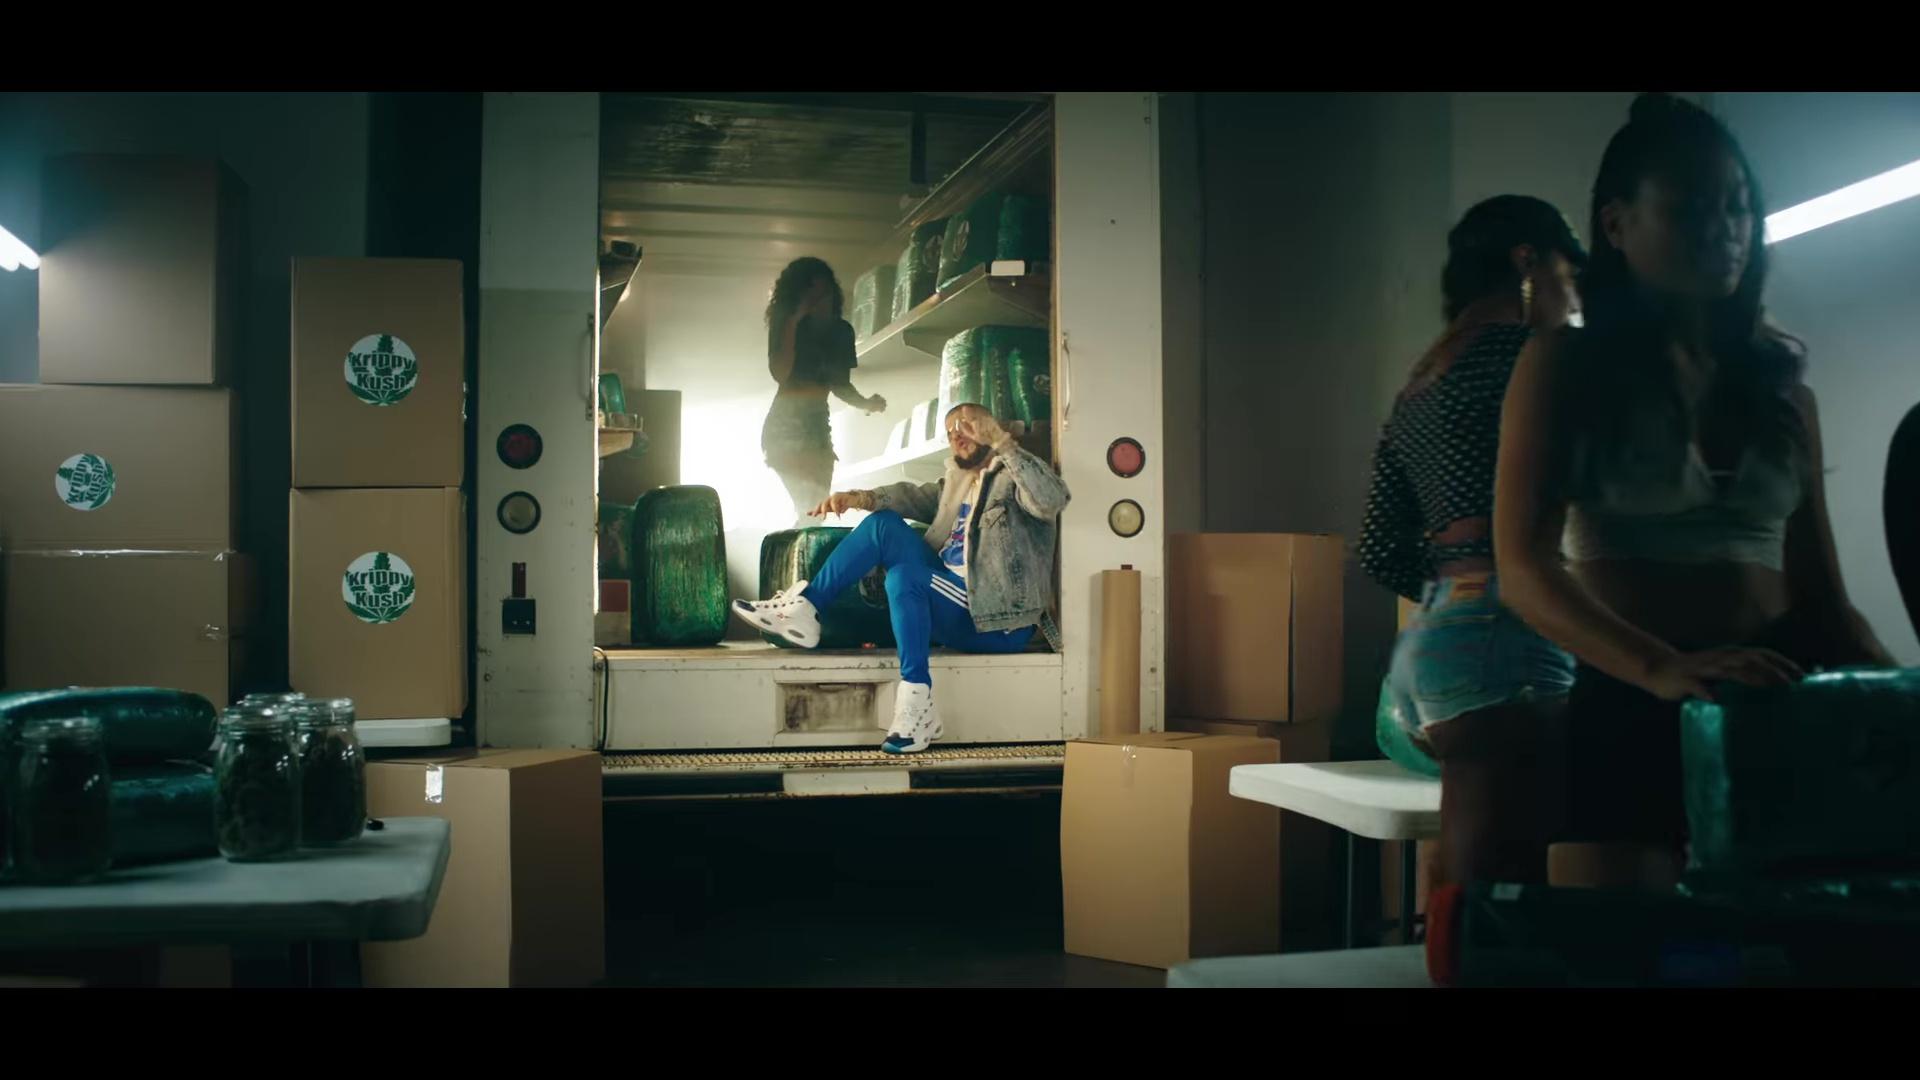 Elysium Matt Damon Adidas Shoes